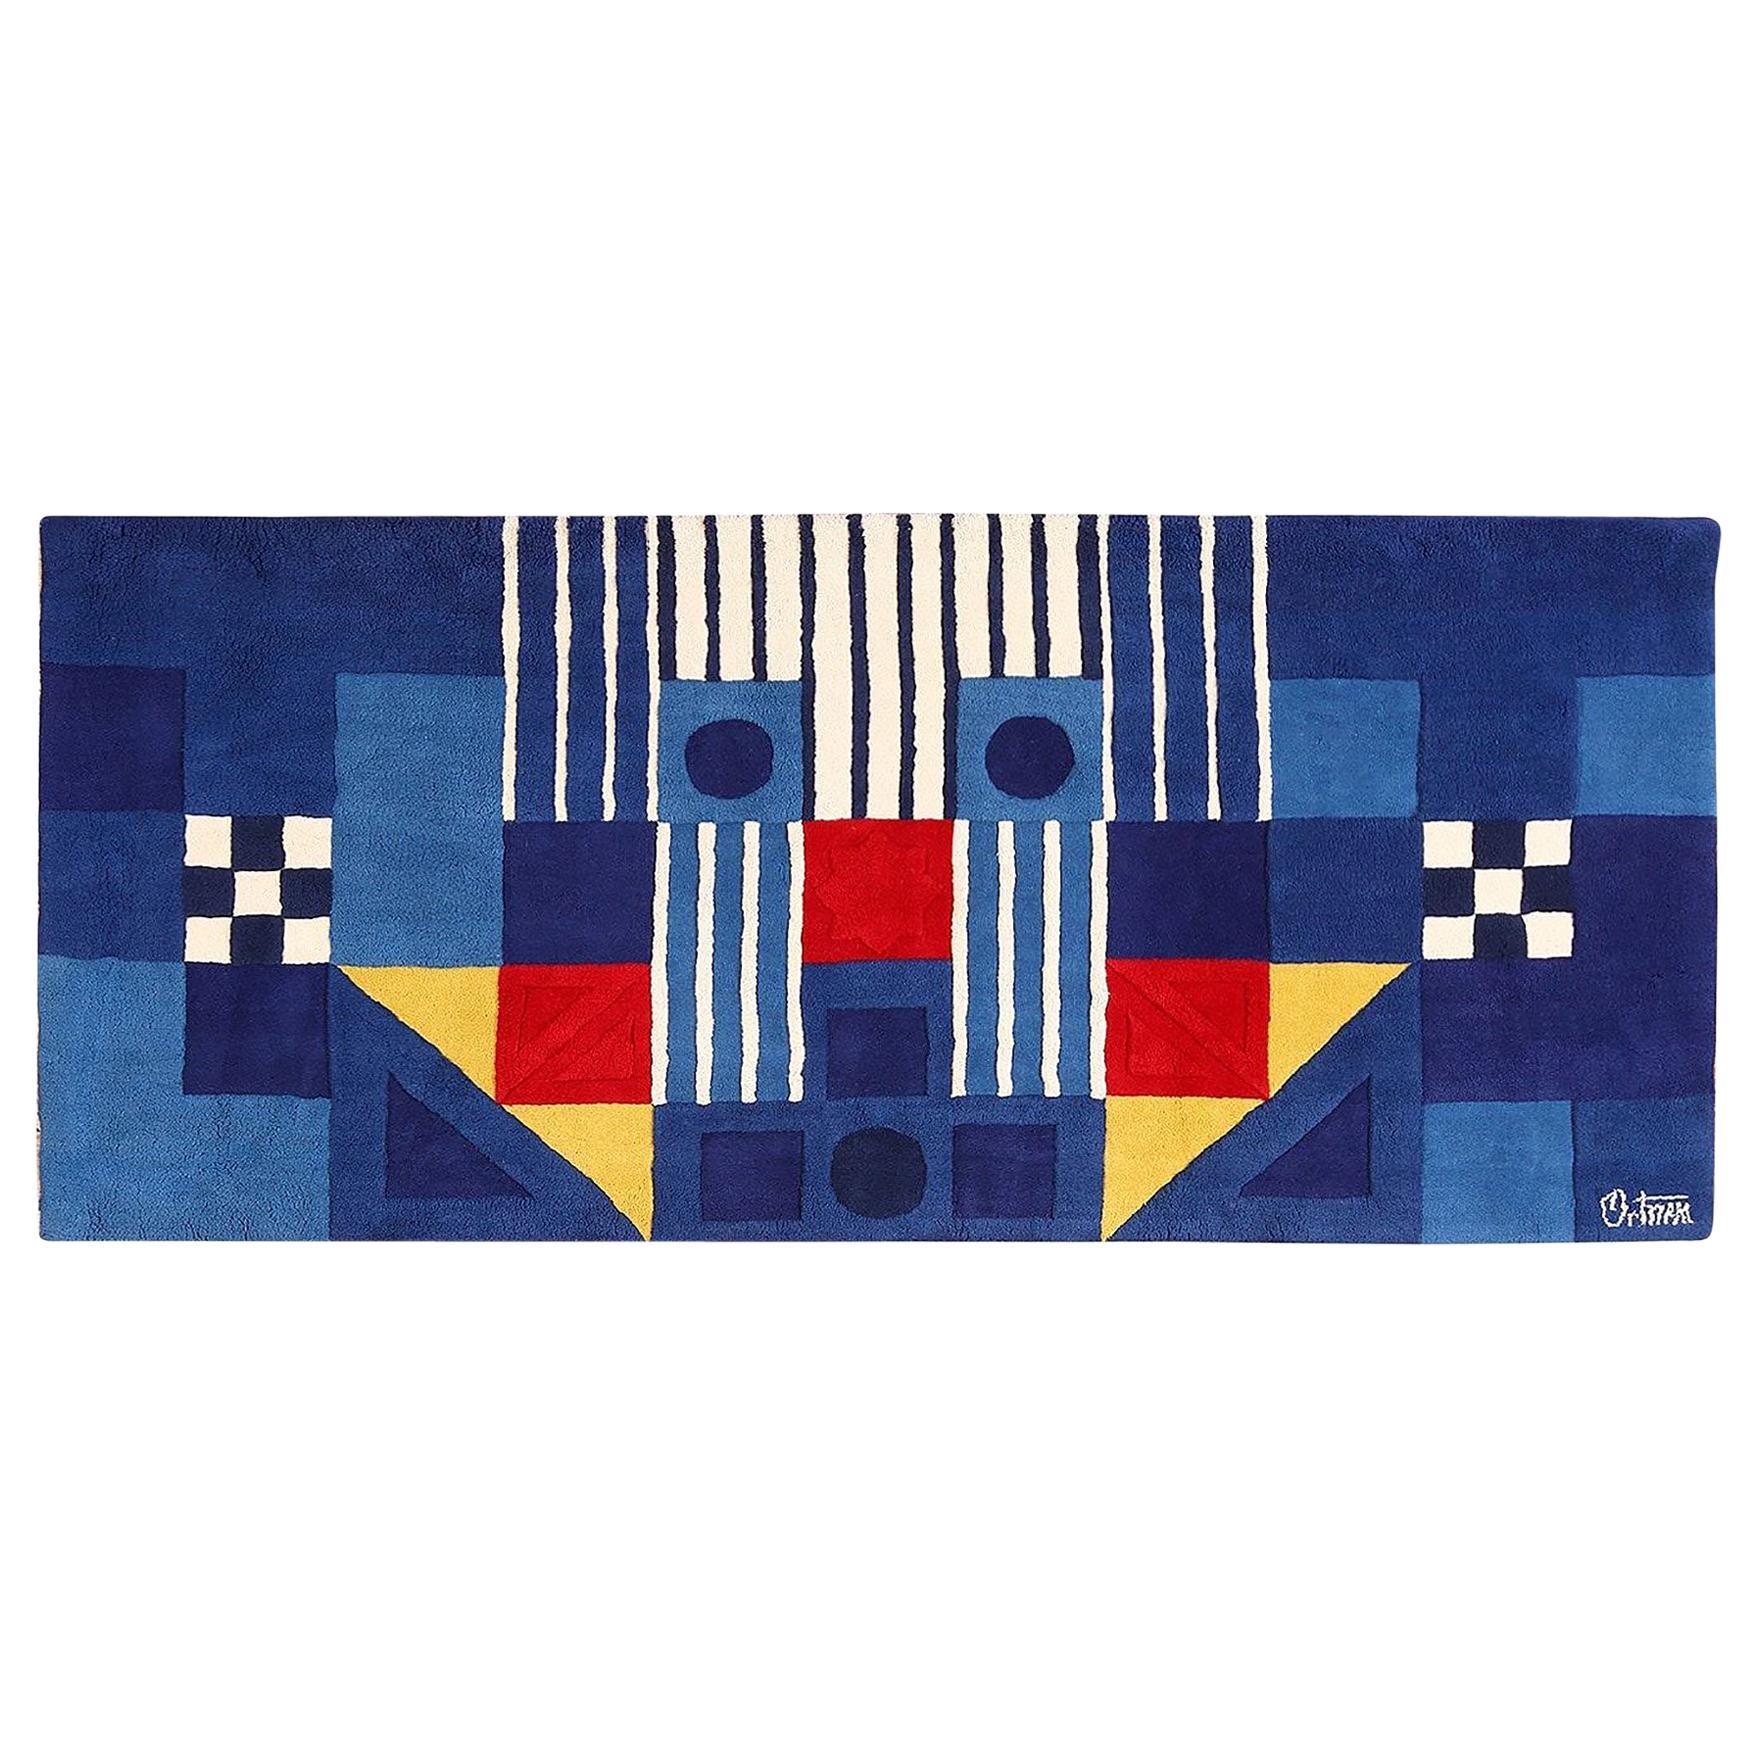 Blue Vintage George Earl Ortman Art Rug. Size: 9 ft x 4 ft (2.74 m x 1.22 m)